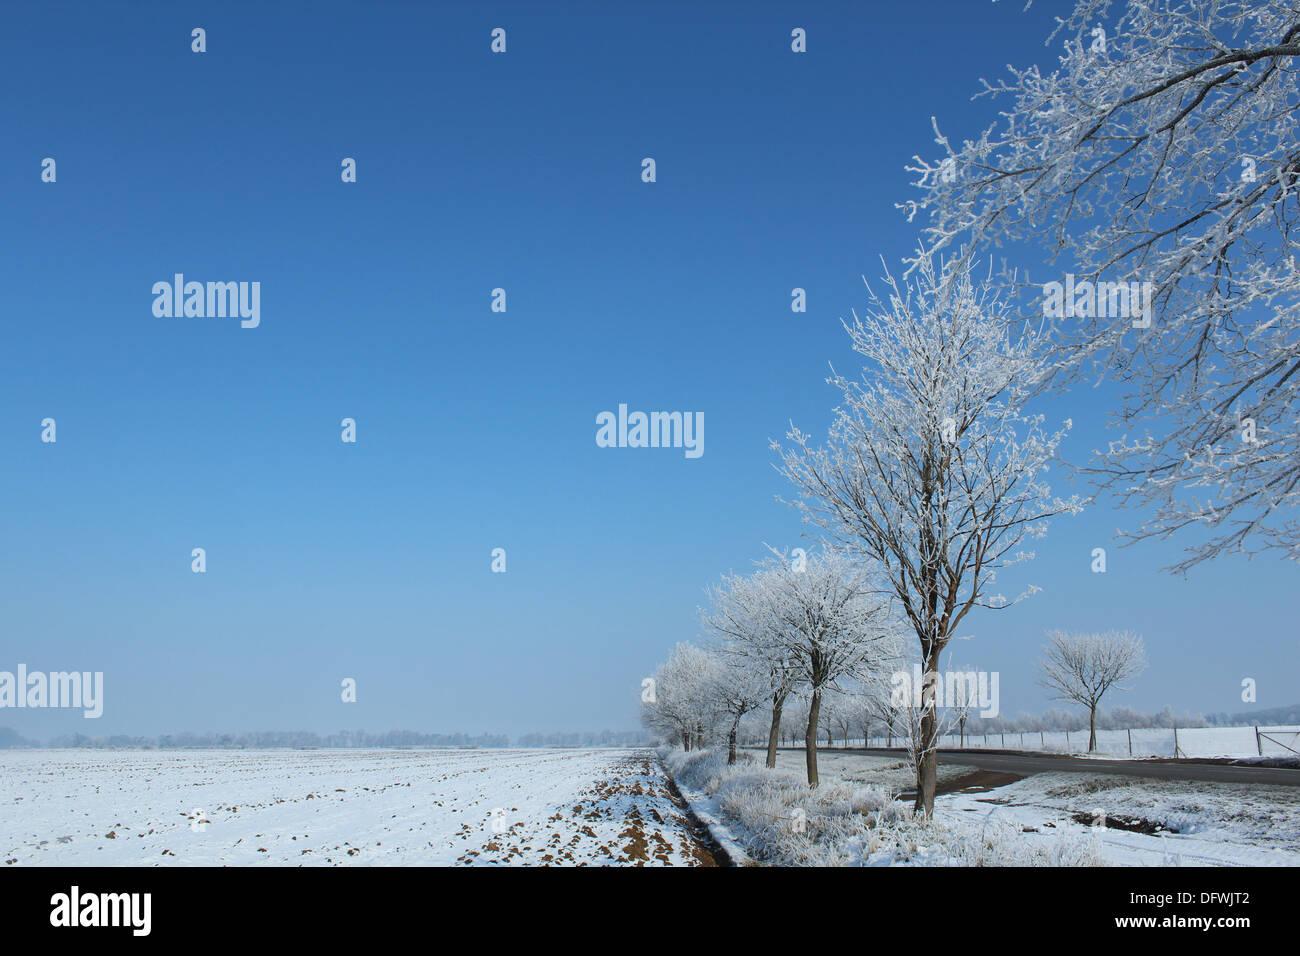 Winter scene vivid blue sky with white trees - Stock Image